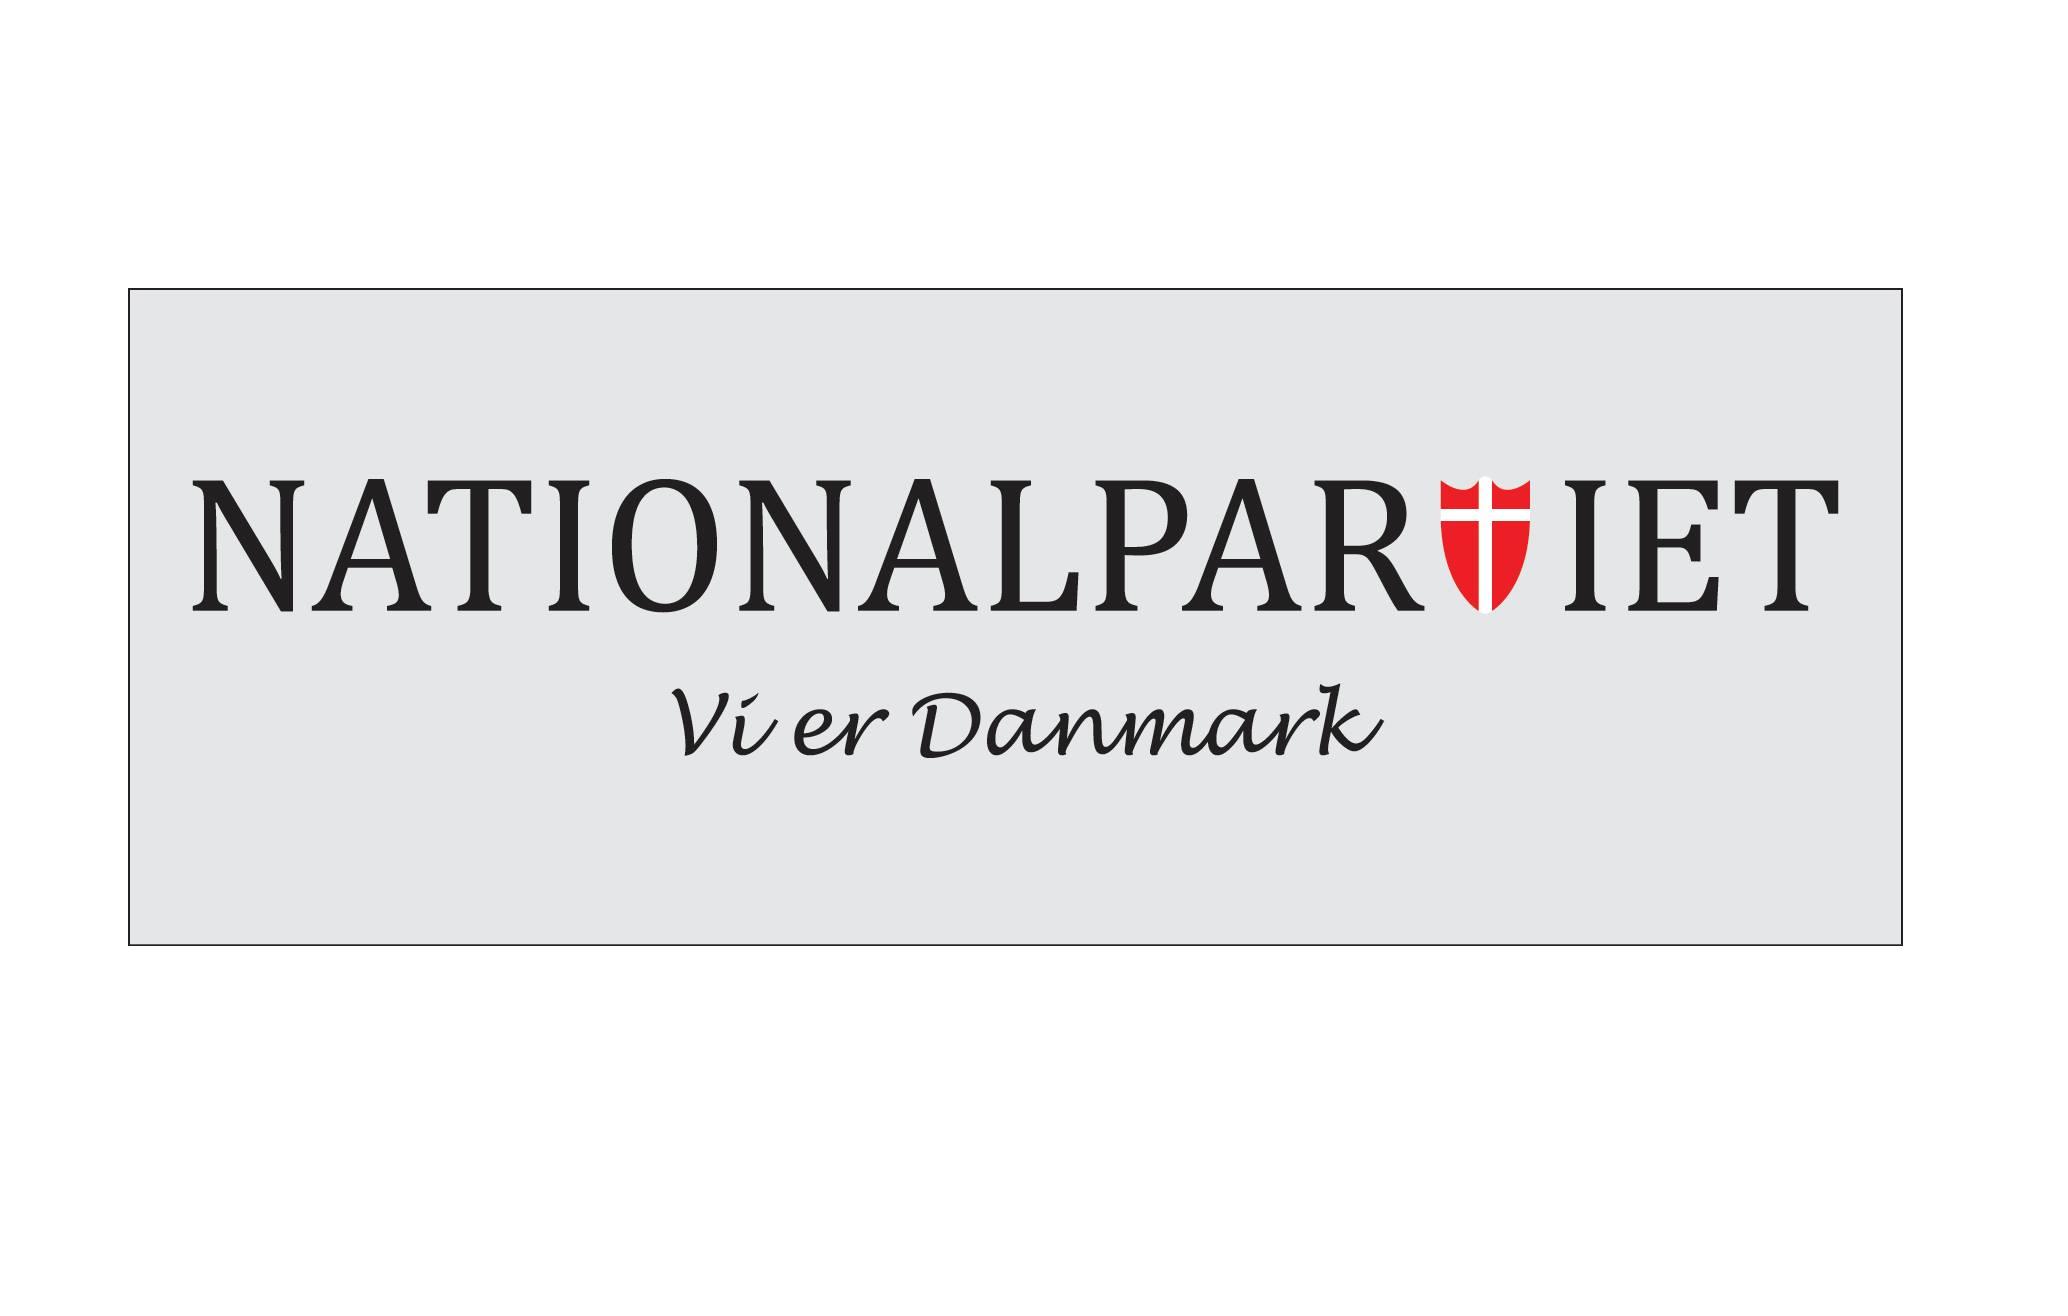 Nationalpartiet